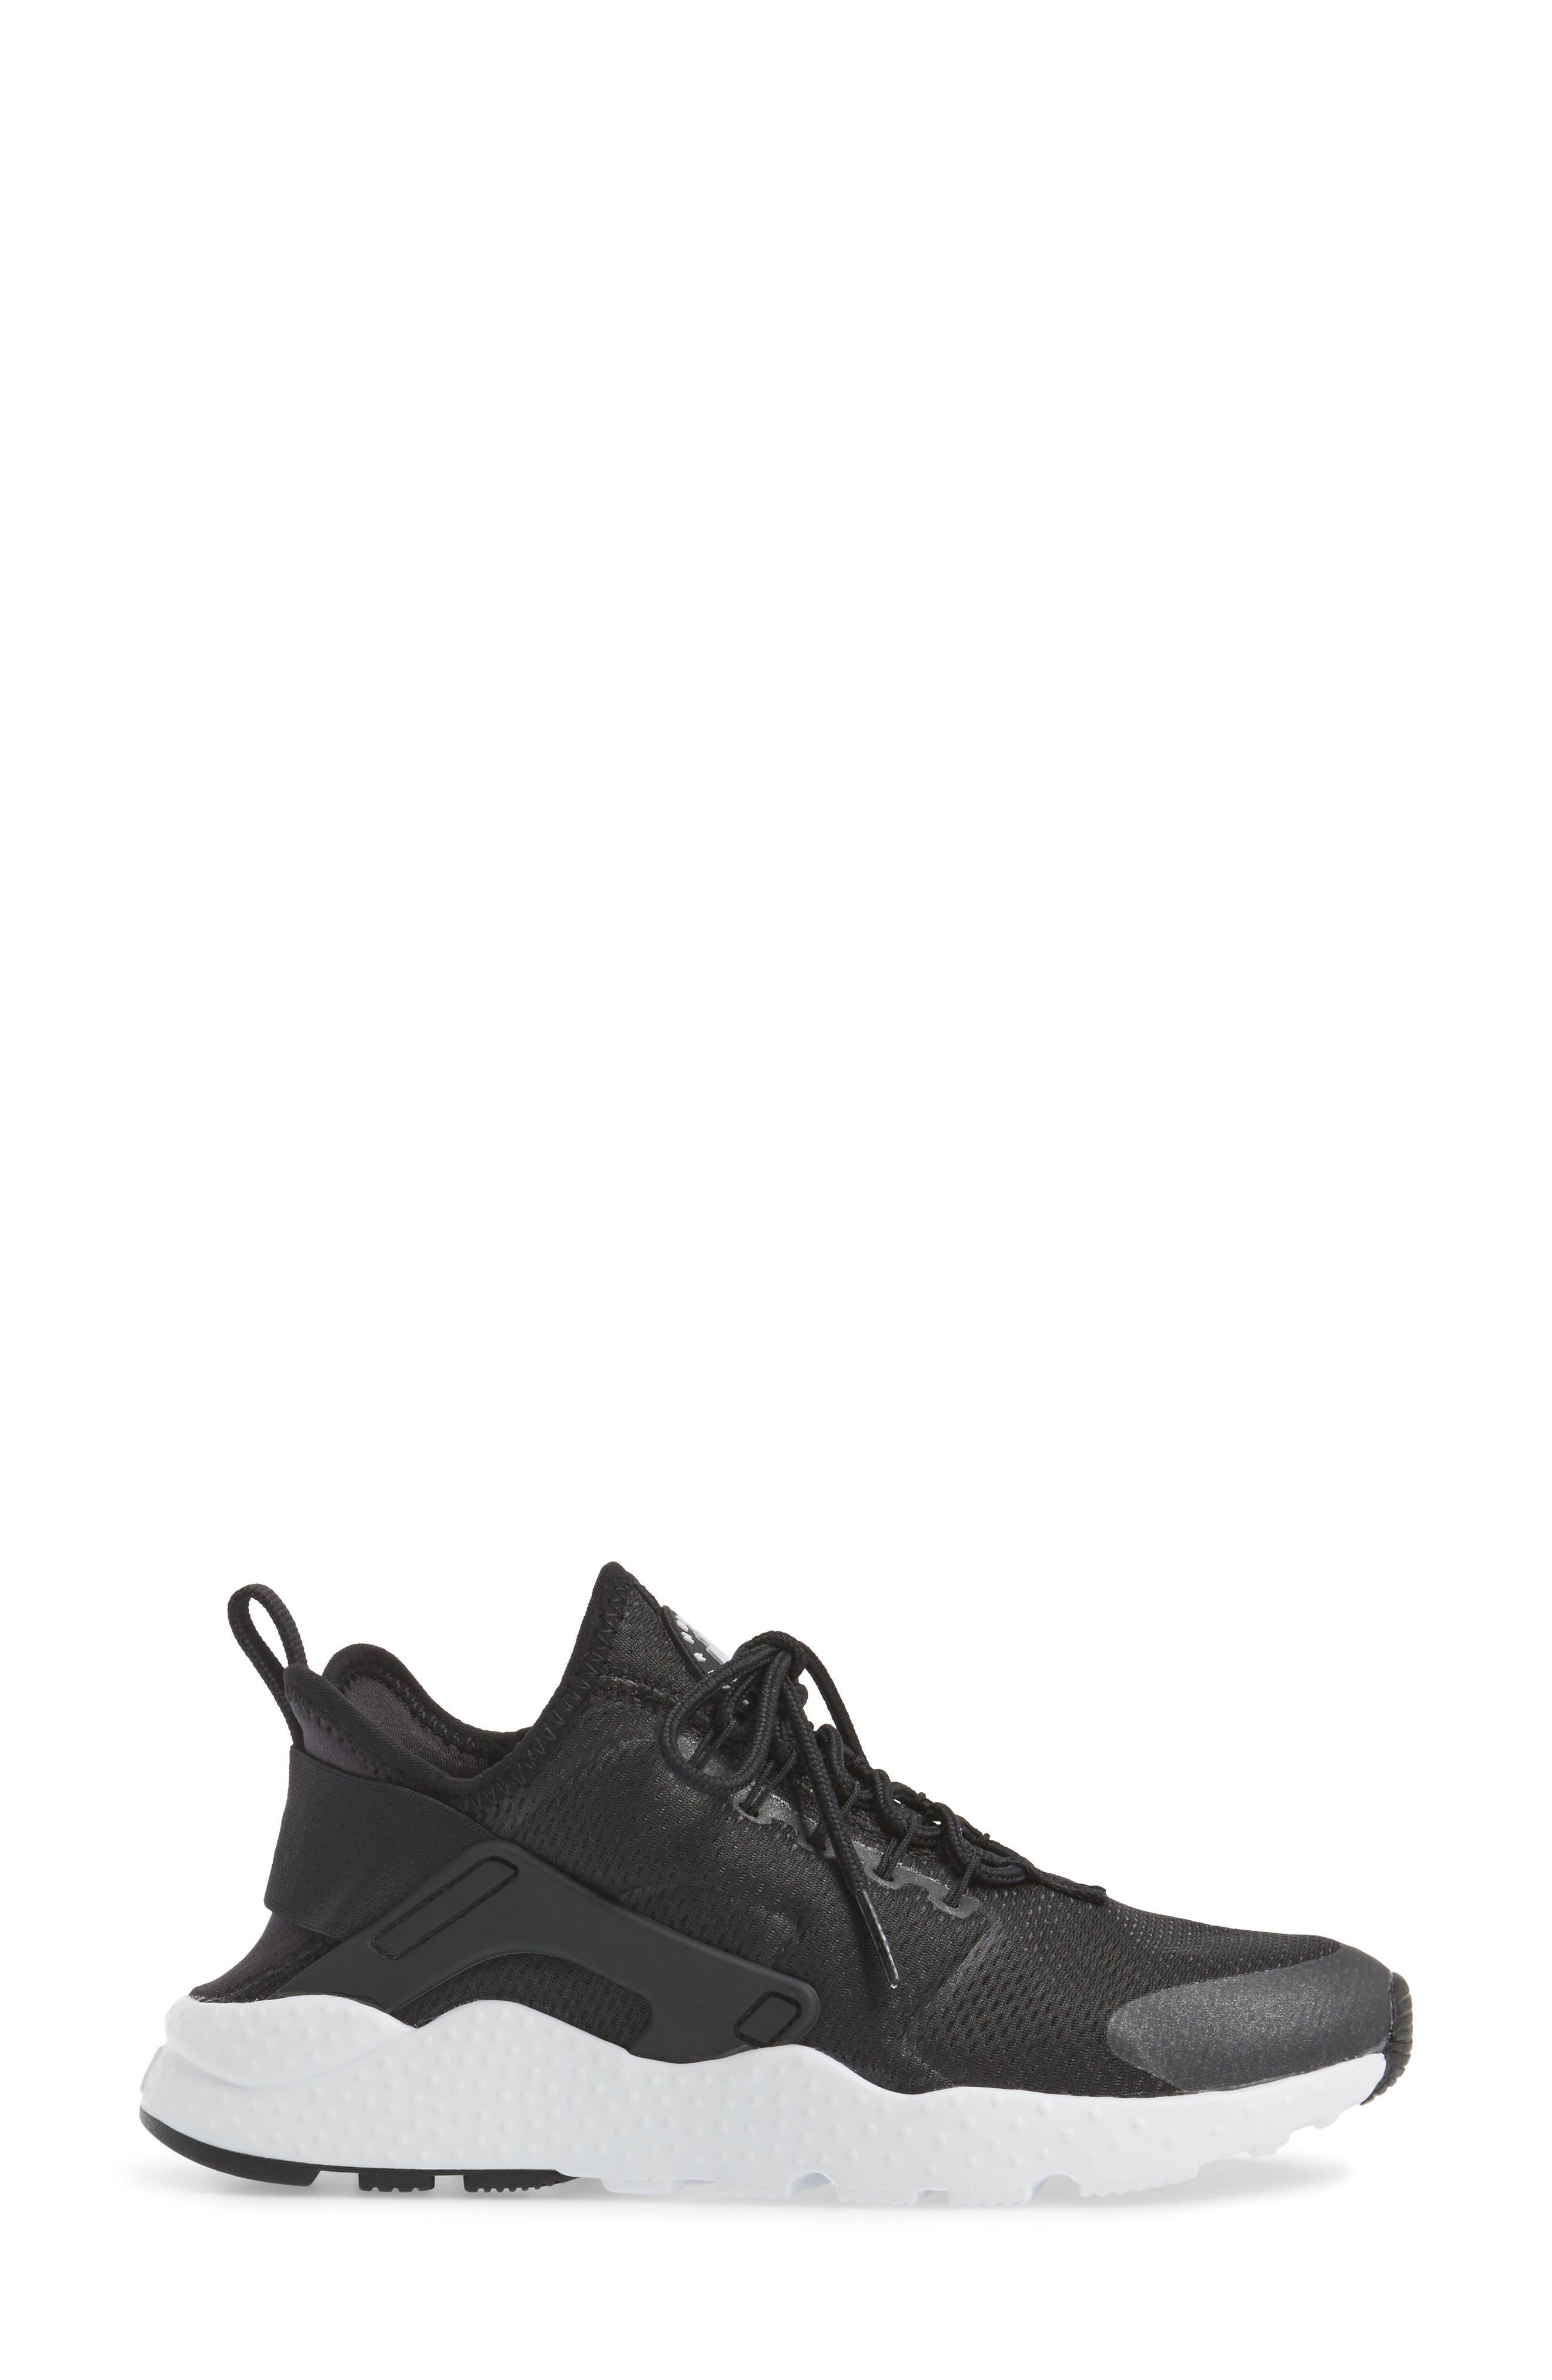 Air Huarache Sneaker,                             Alternate thumbnail 87, color,